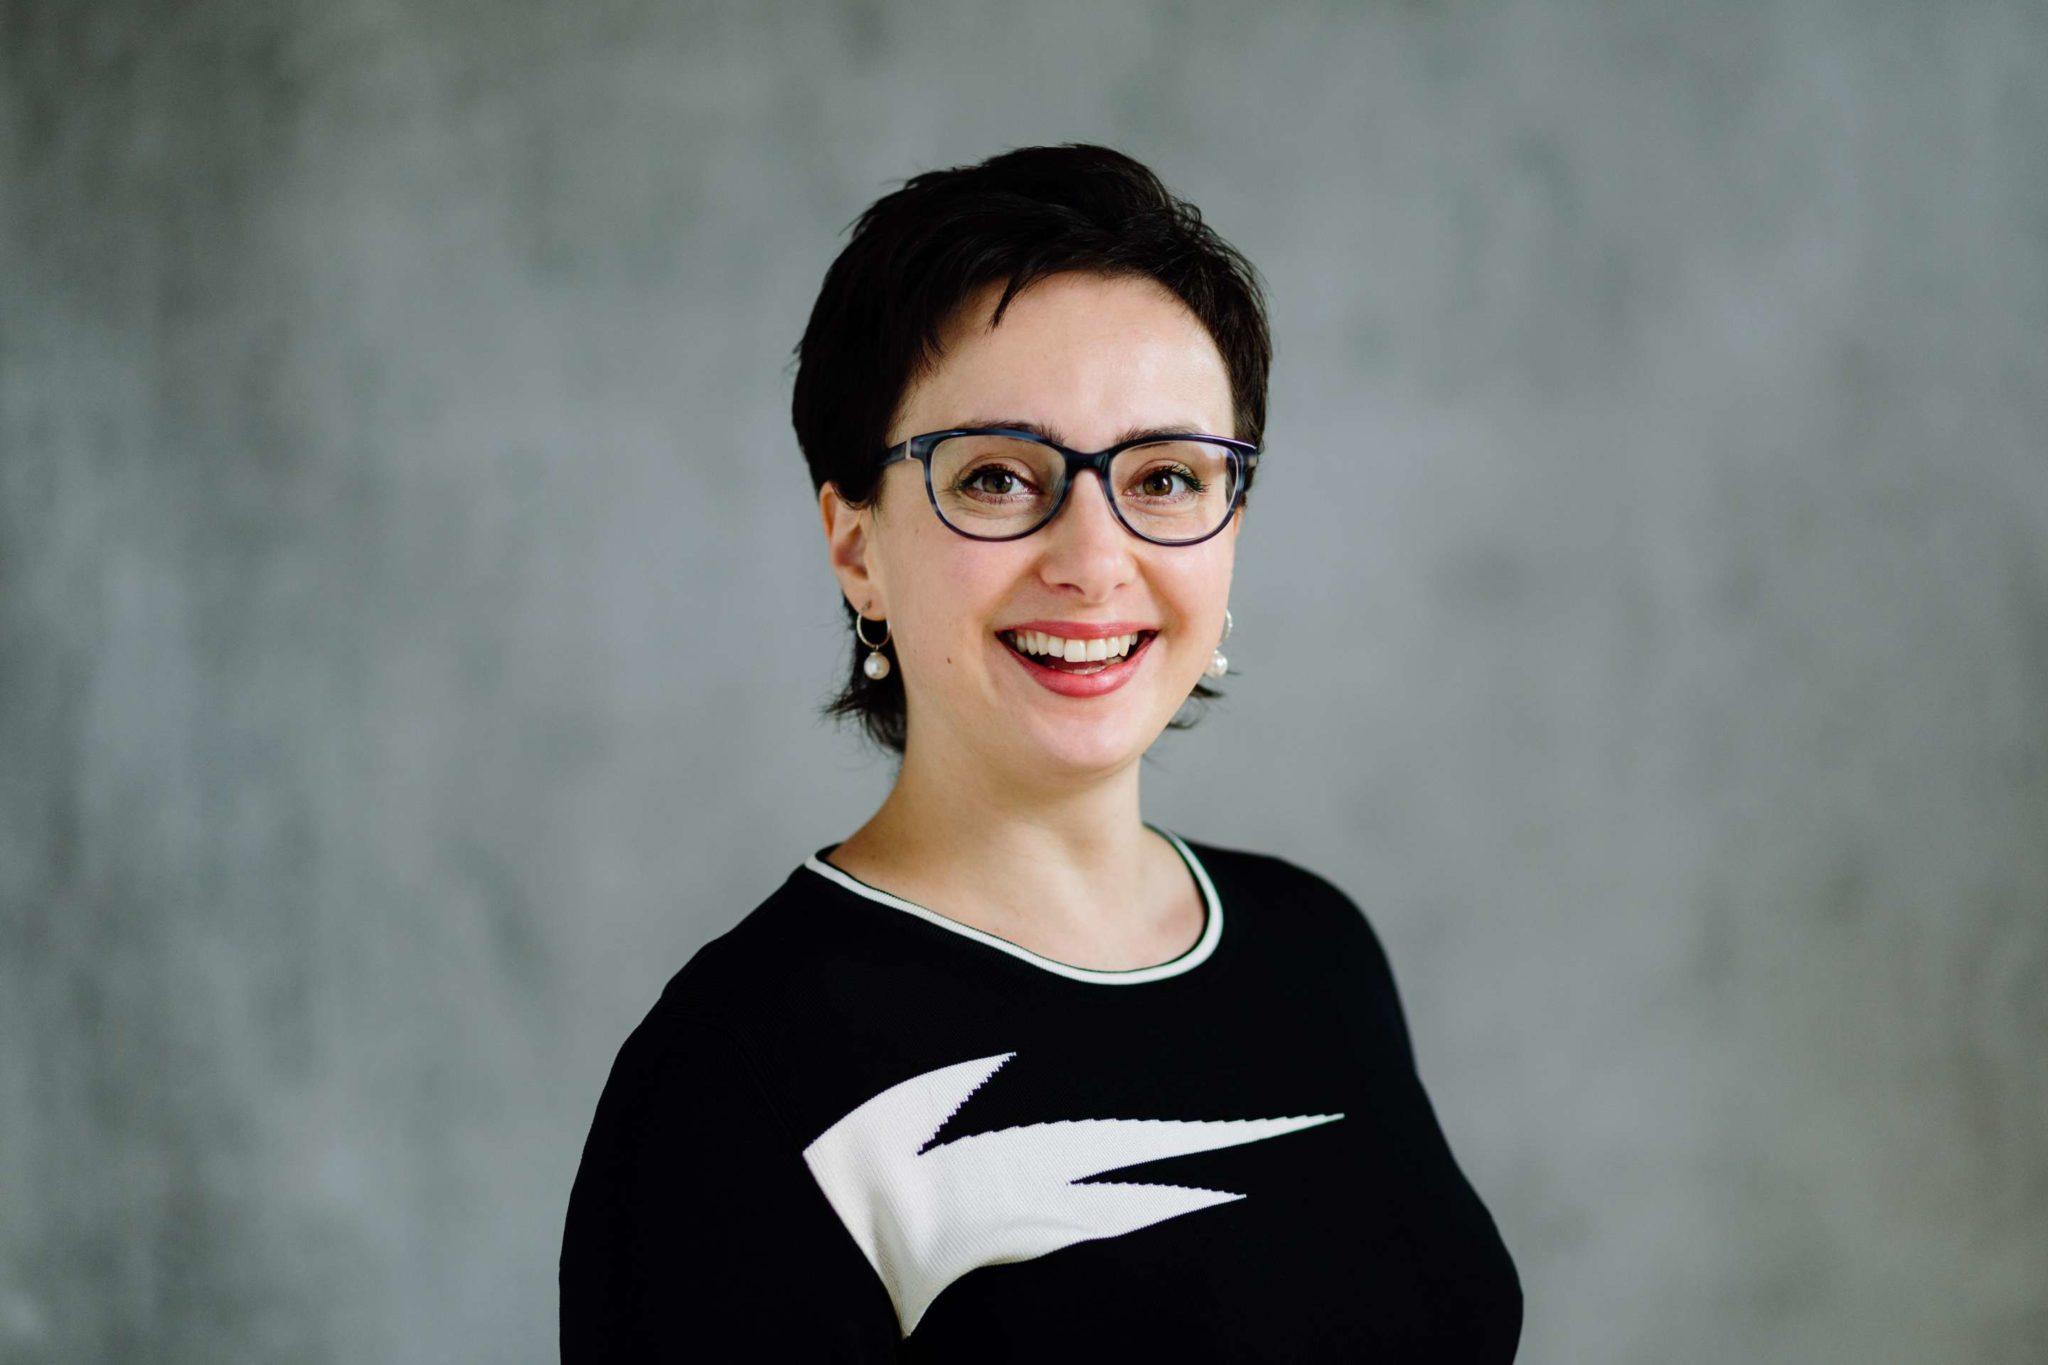 Irina Ploechinger Gründerin von Stratval Communications